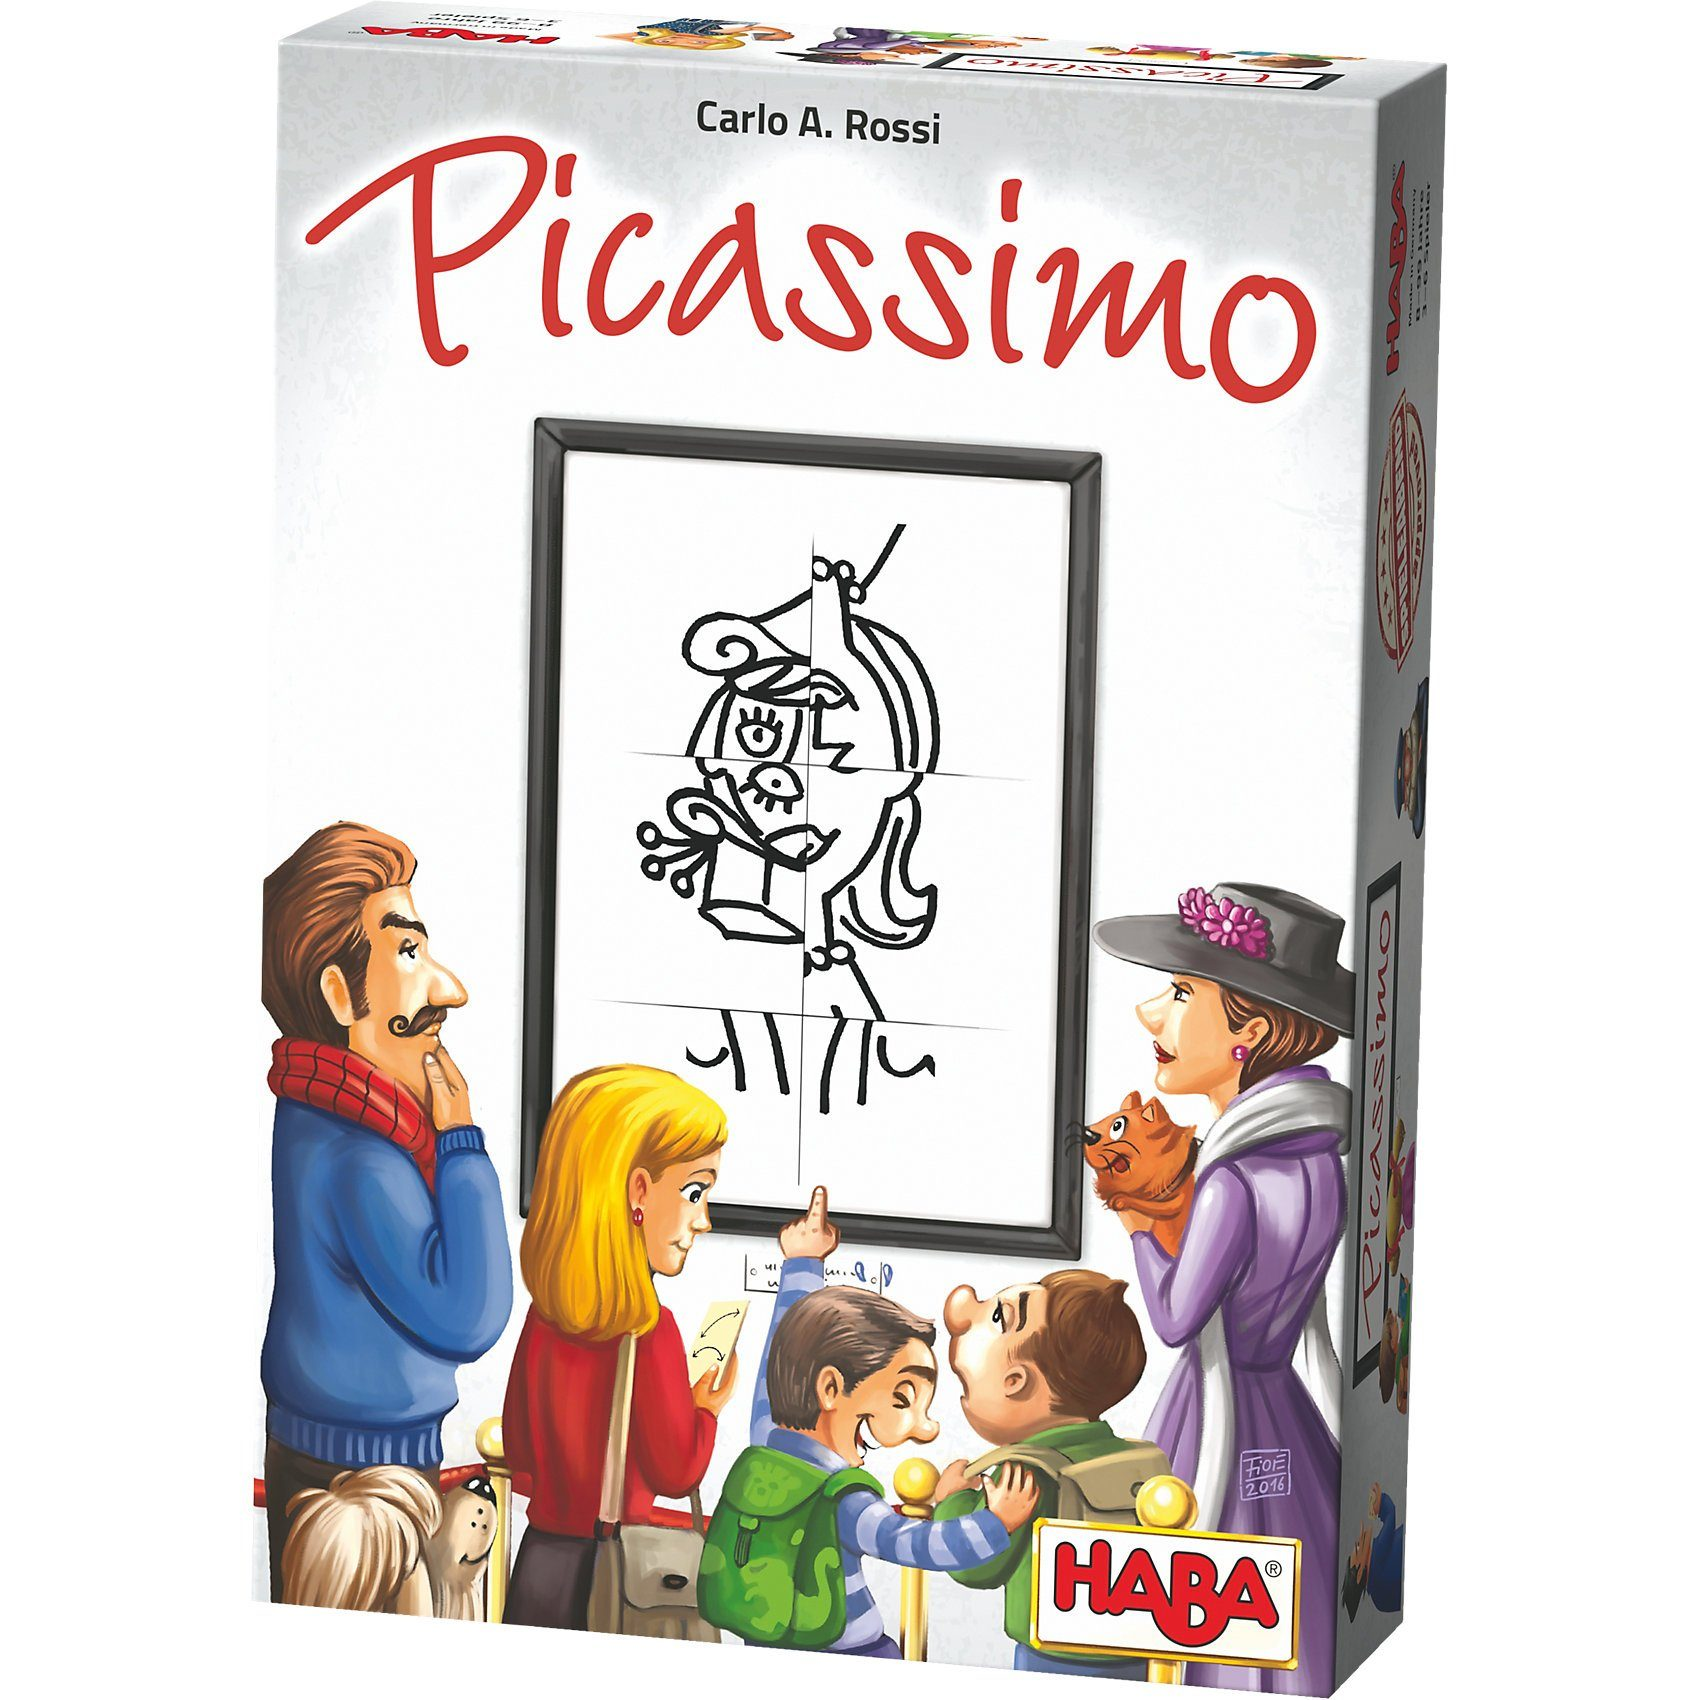 Haba Picassimo